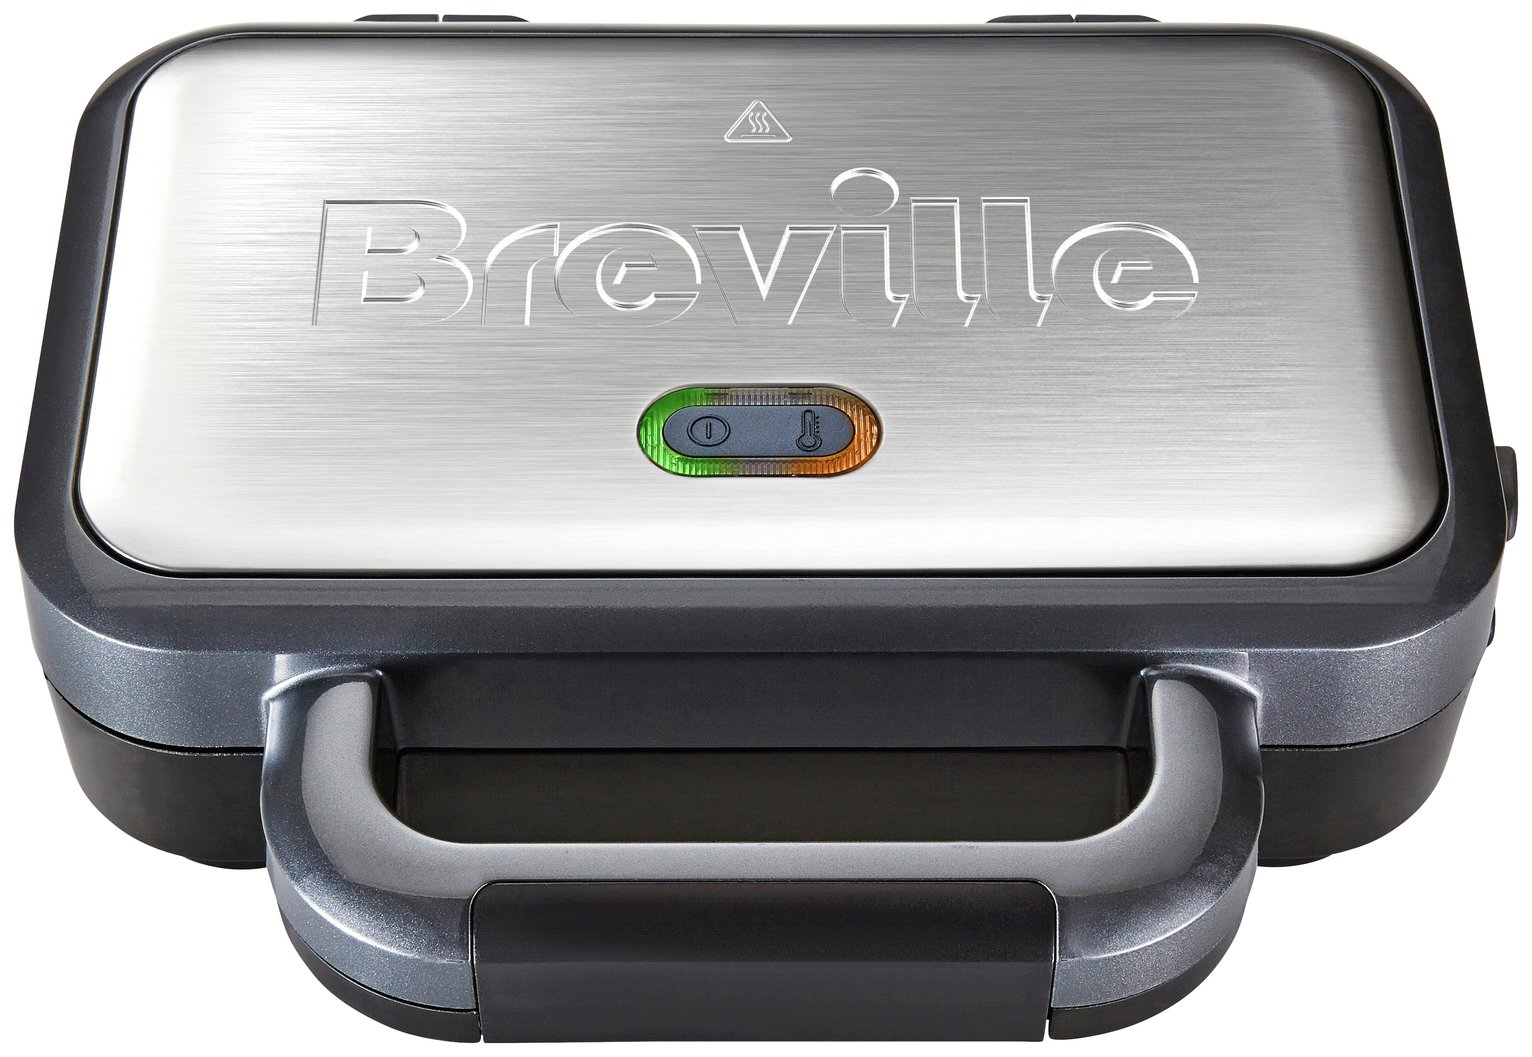 Image of Breville - VST041 2 Slice Deep Fill Sandwich Toaster - Silver